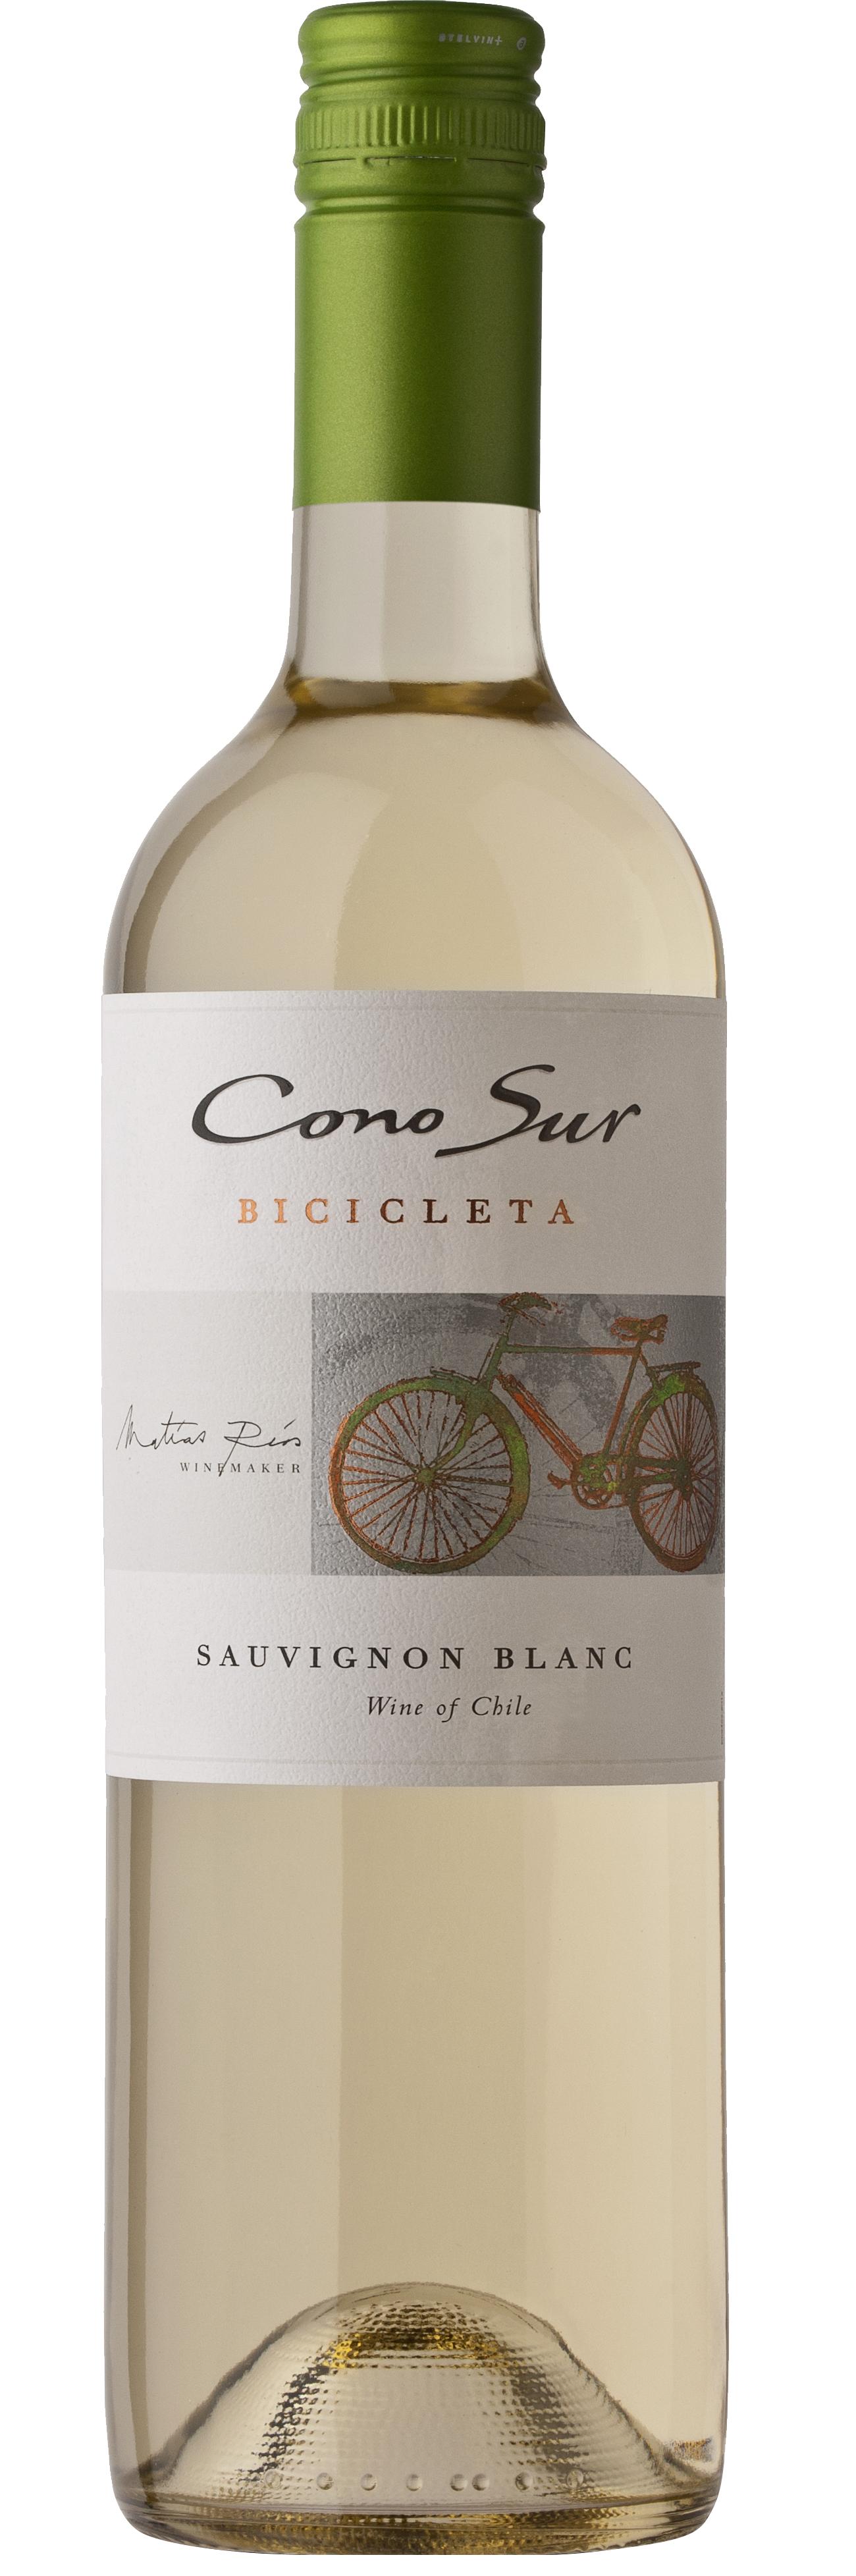 Cono Sur Bicicleta Sauvignon Blanc Bottle.jpg